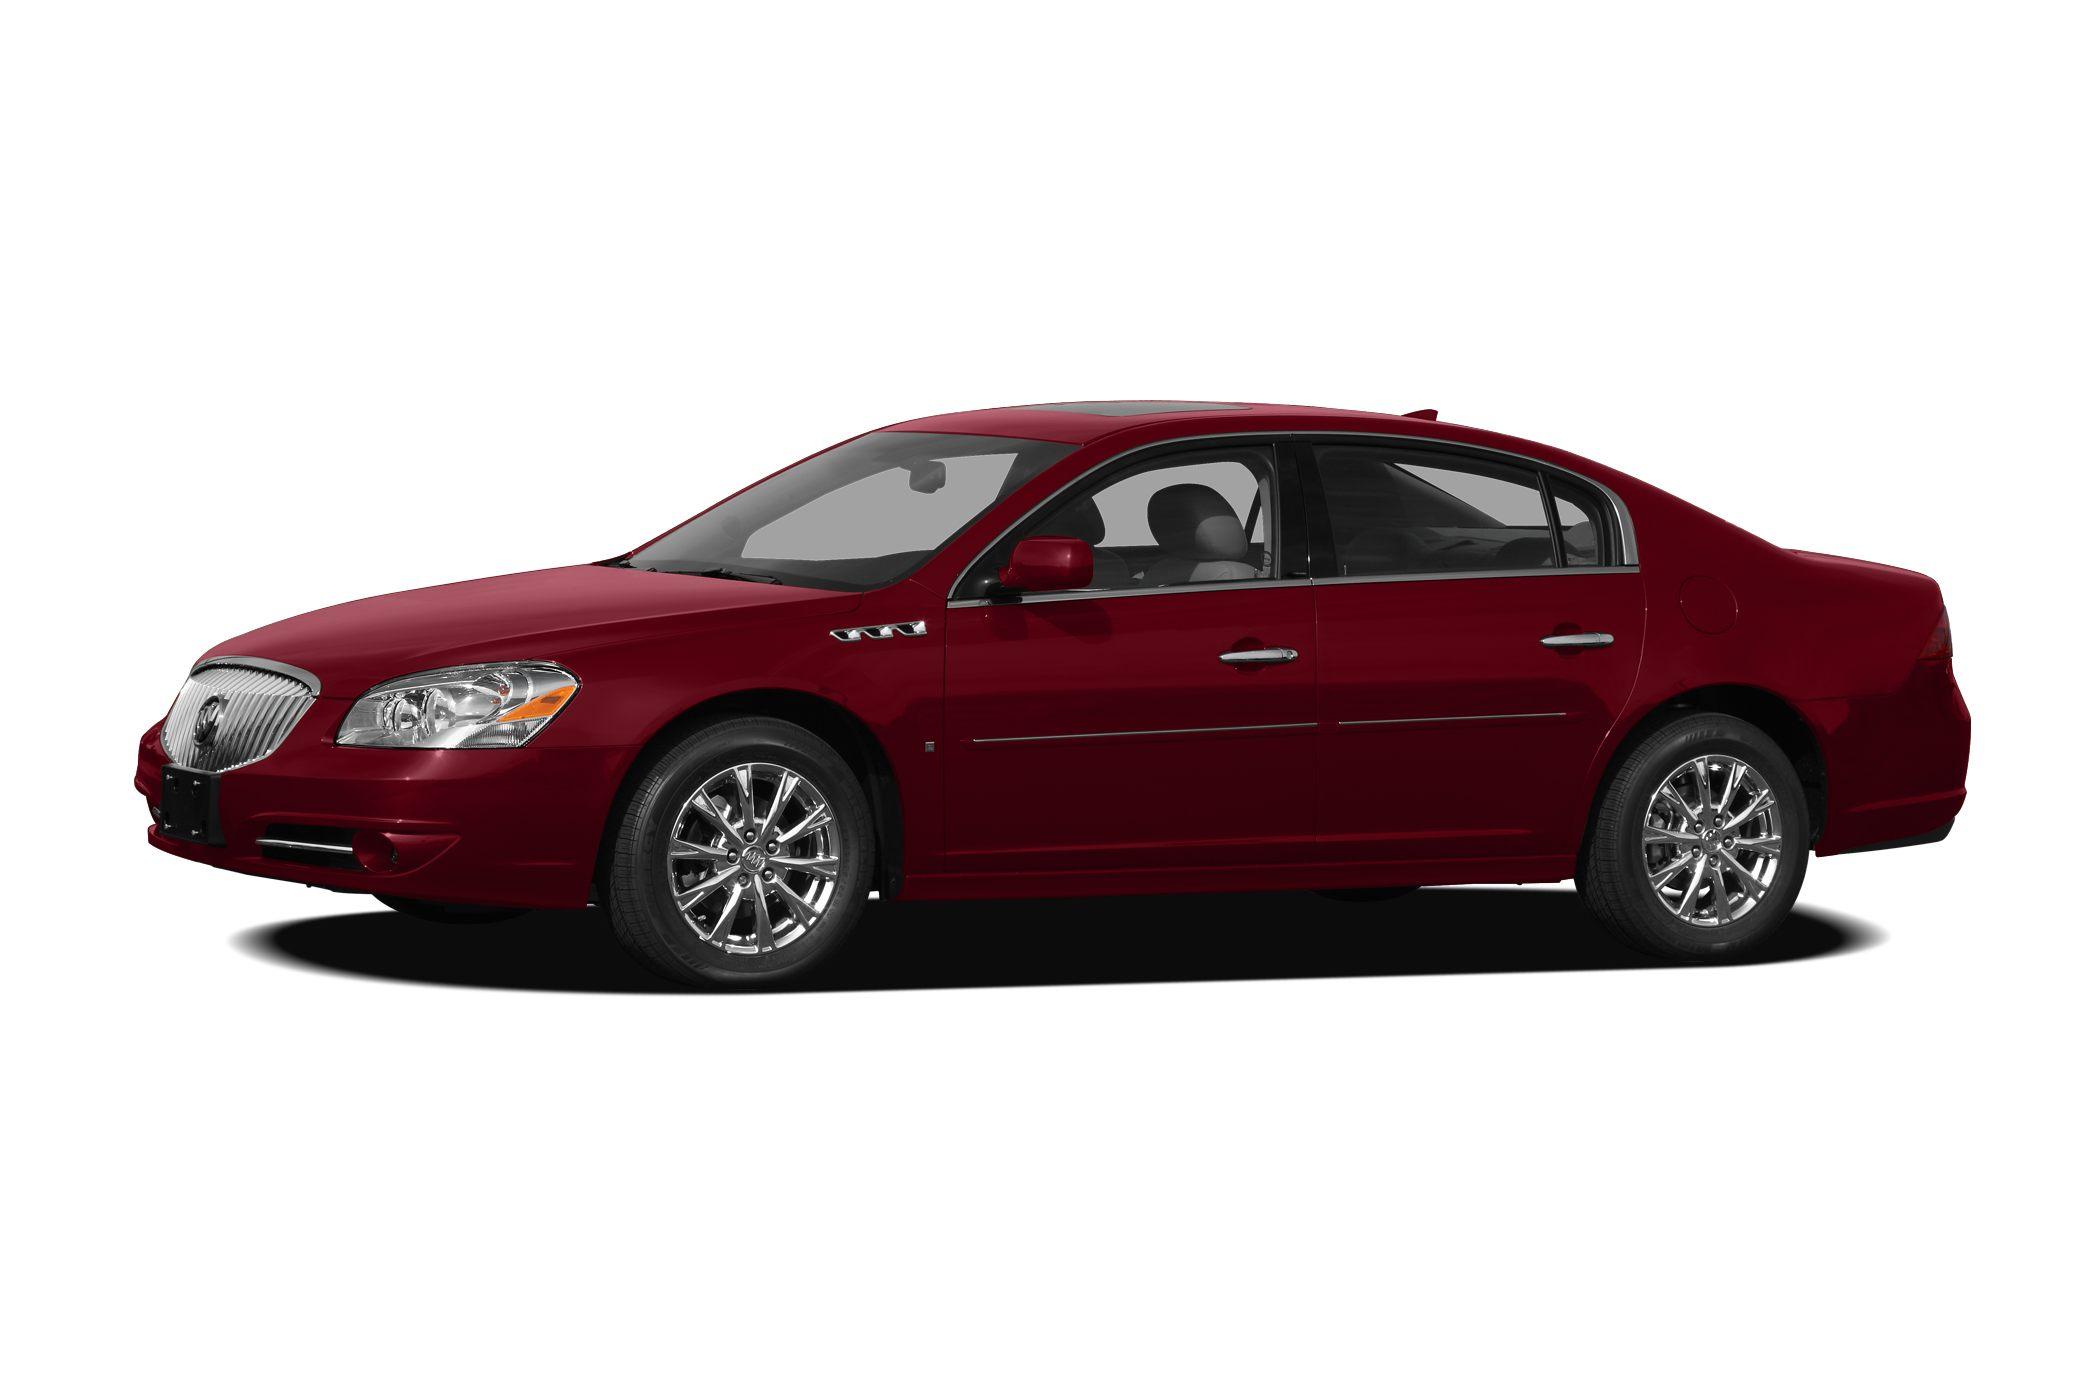 2010 Buick Lucerne CXL Premium Miles 34265Stock 124766A VIN 1G4HJ5EM3AU135732